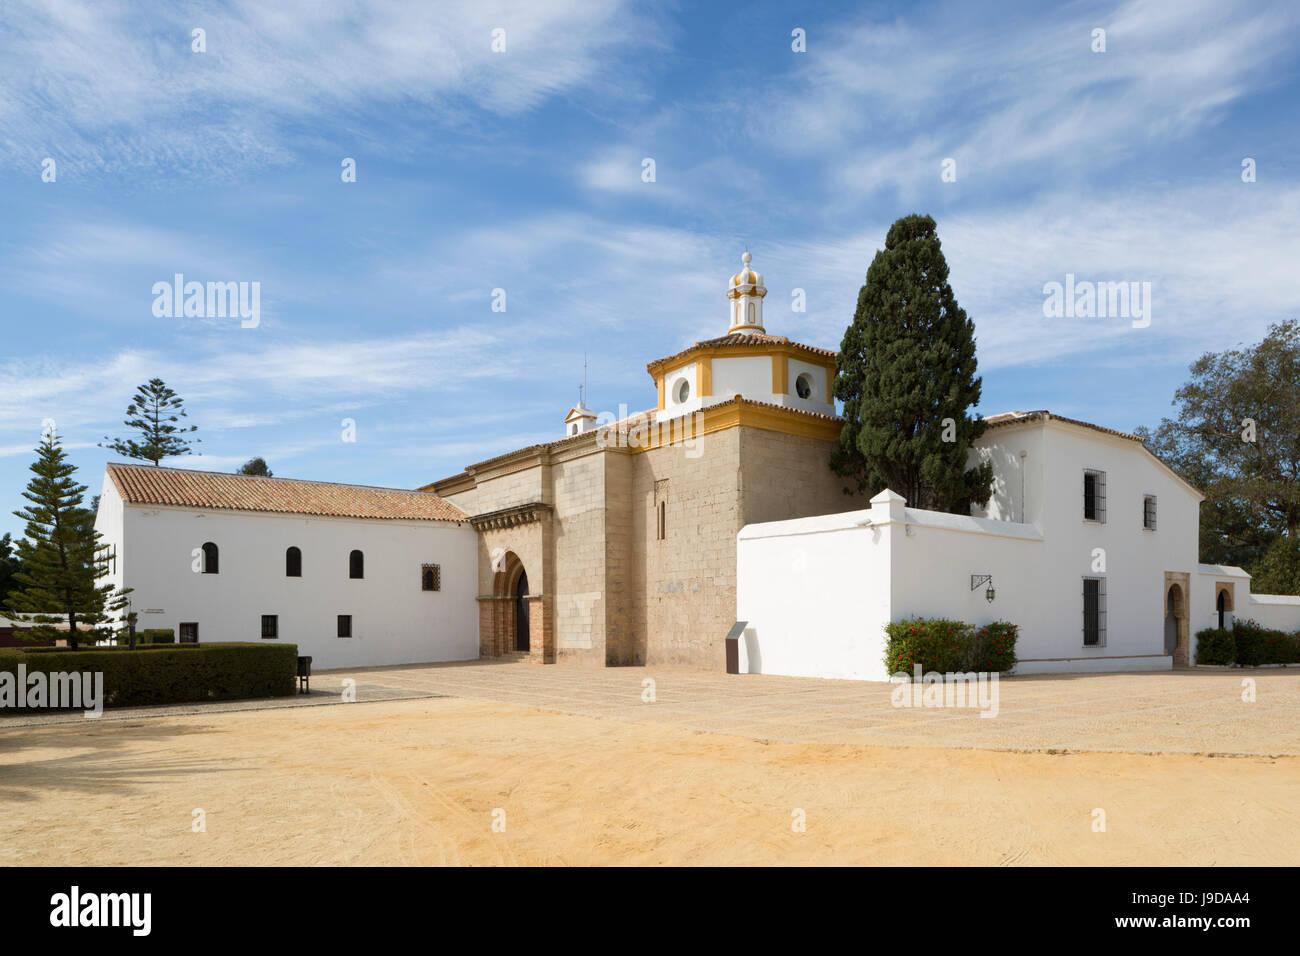 La Rabida Monastery where Columbus stayed before historic voyage of 1492, La Rabida, Huelva, Costa de la Luz, Andalucia, - Stock Image